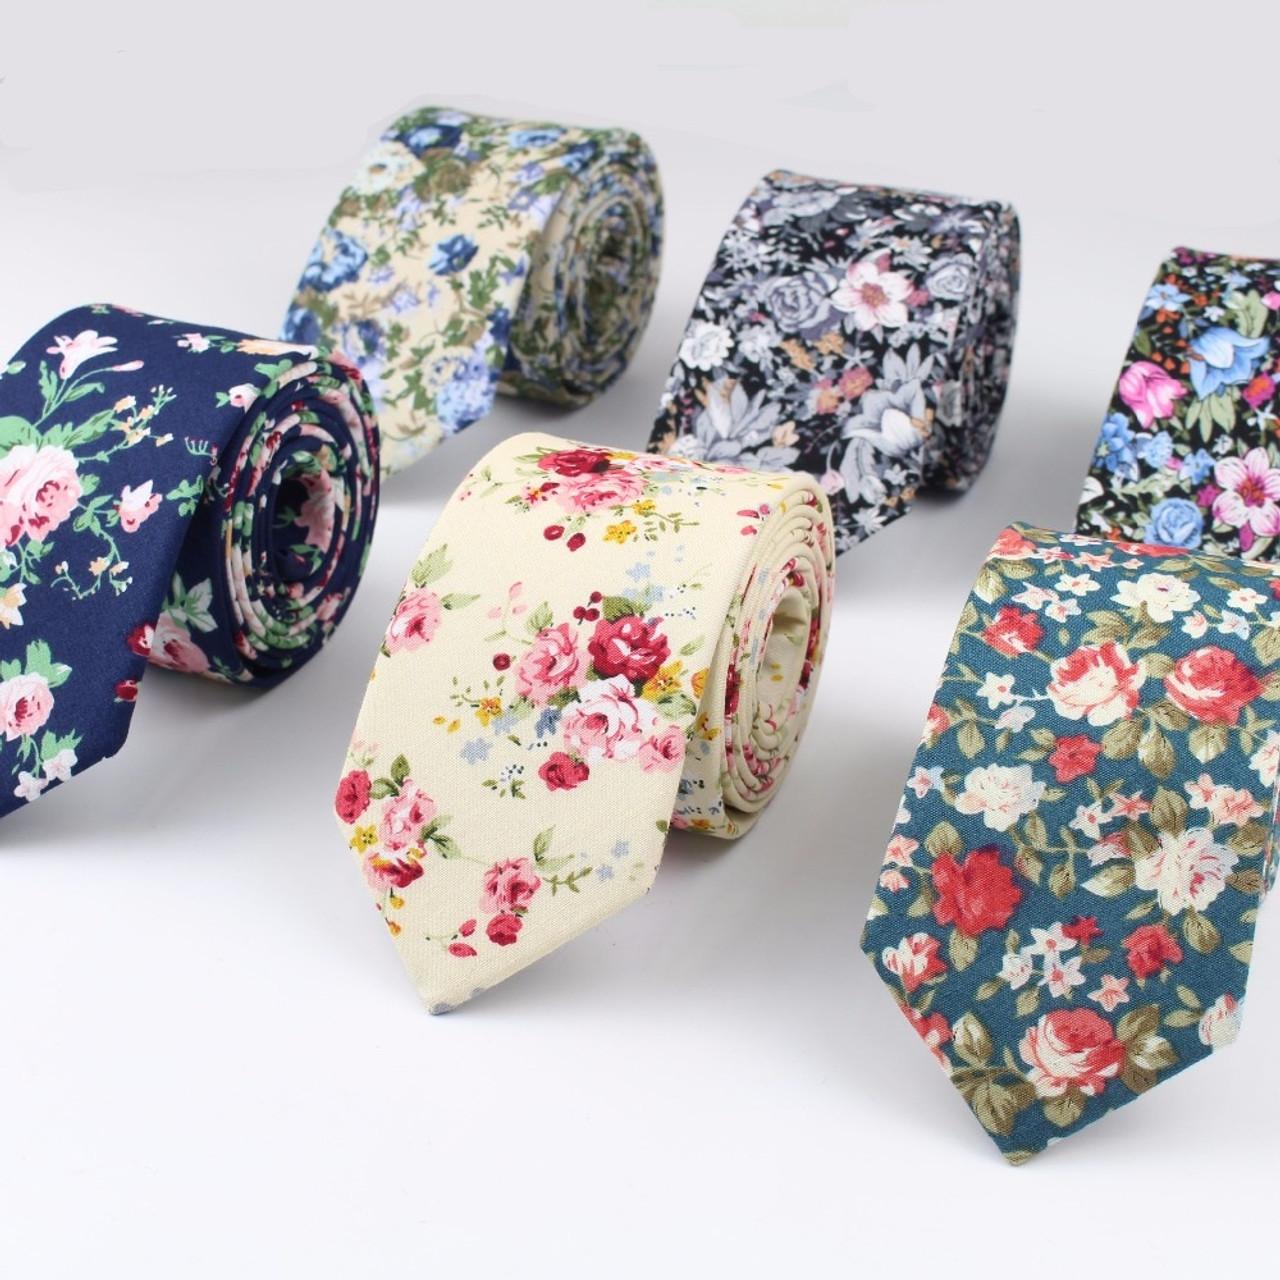 Mens Anchor Pattern Tie Skinny Narrow Necktie Various Designs